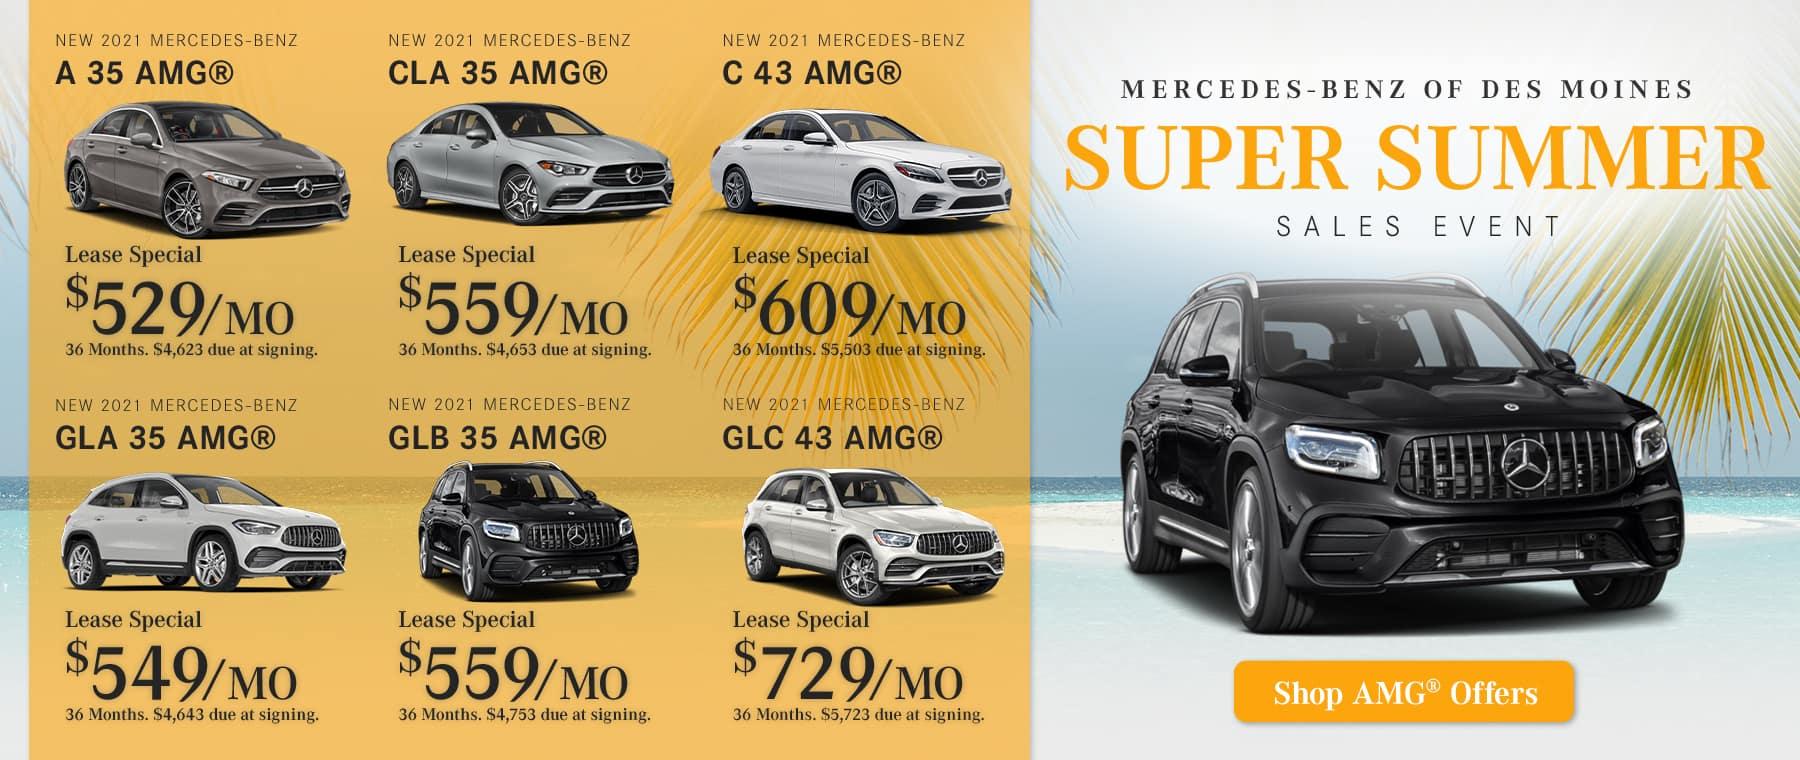 MDIA-21388-Homepage-1800×760-AMG®s